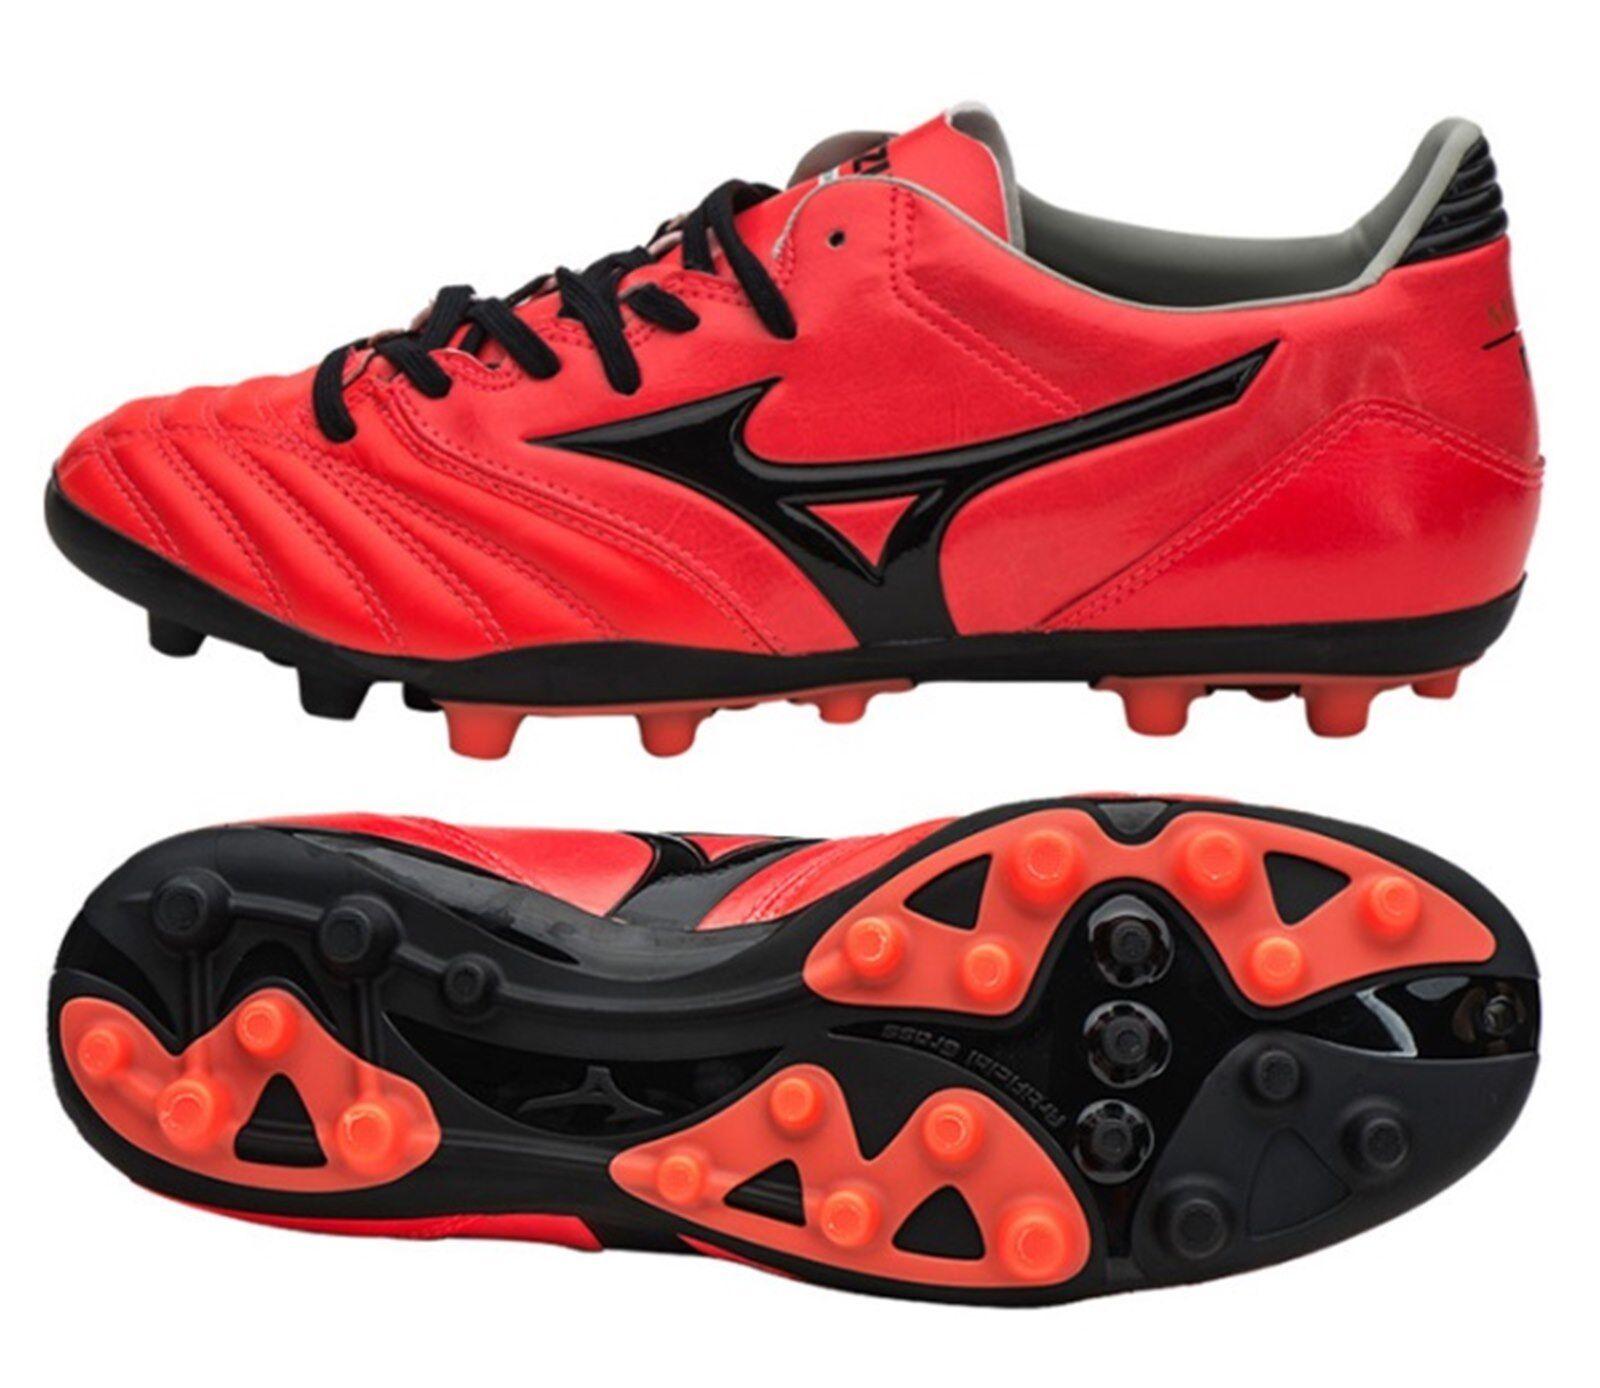 Hombre Mizuno Morelia Neo KL Botines De Fútbol Fútbol Zapatos Rojos AG Spike P1GA175761